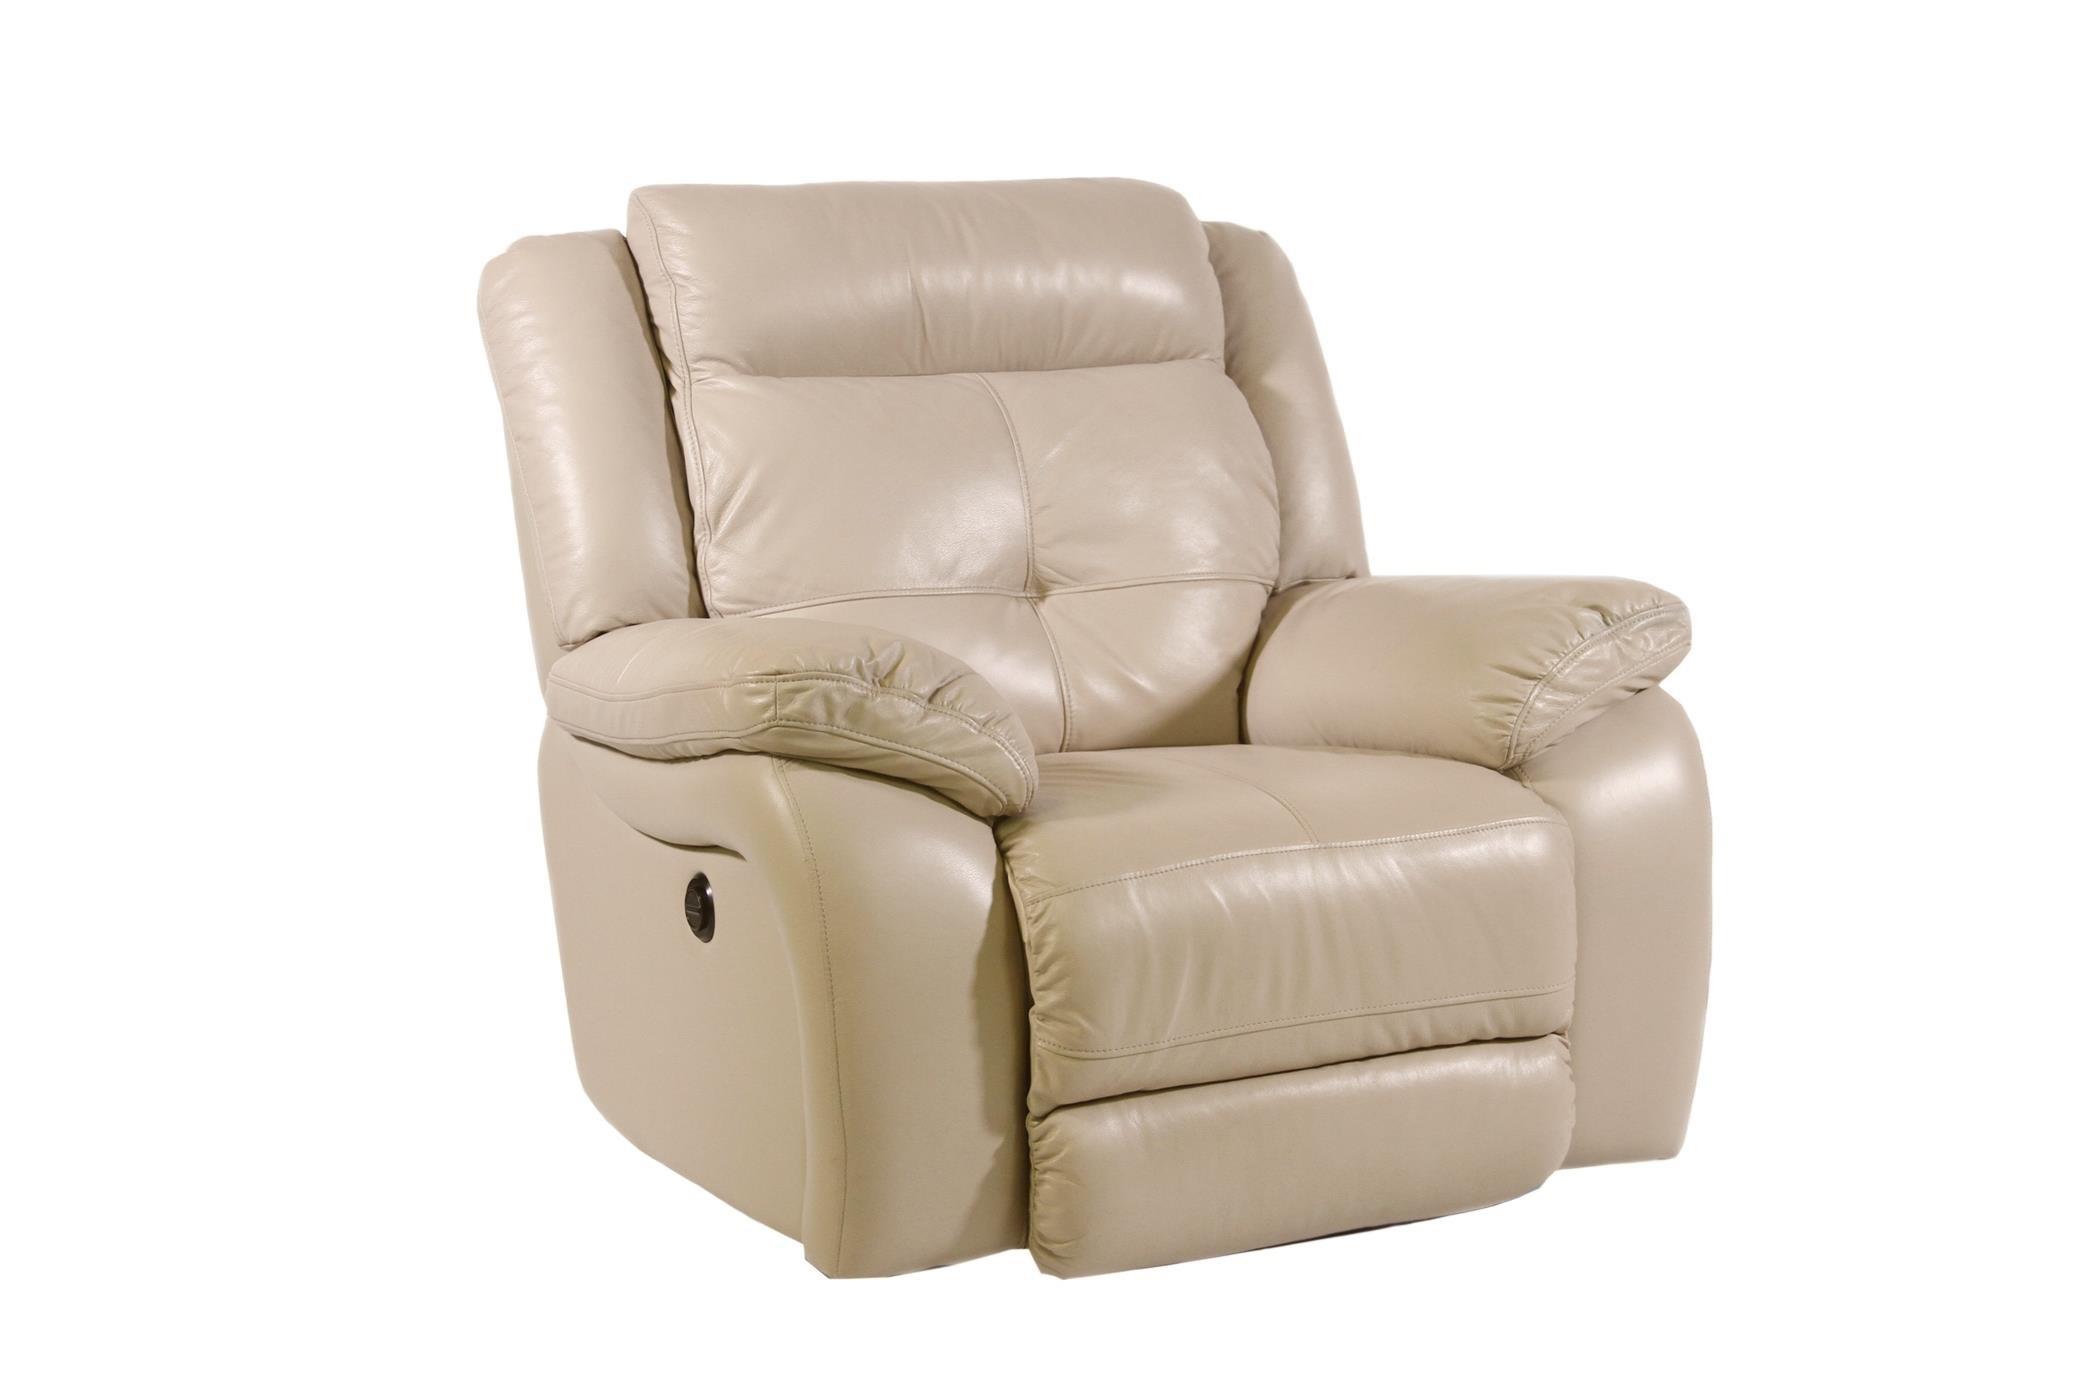 Superieur Futura Leather PebblePower Reclining Chair ...